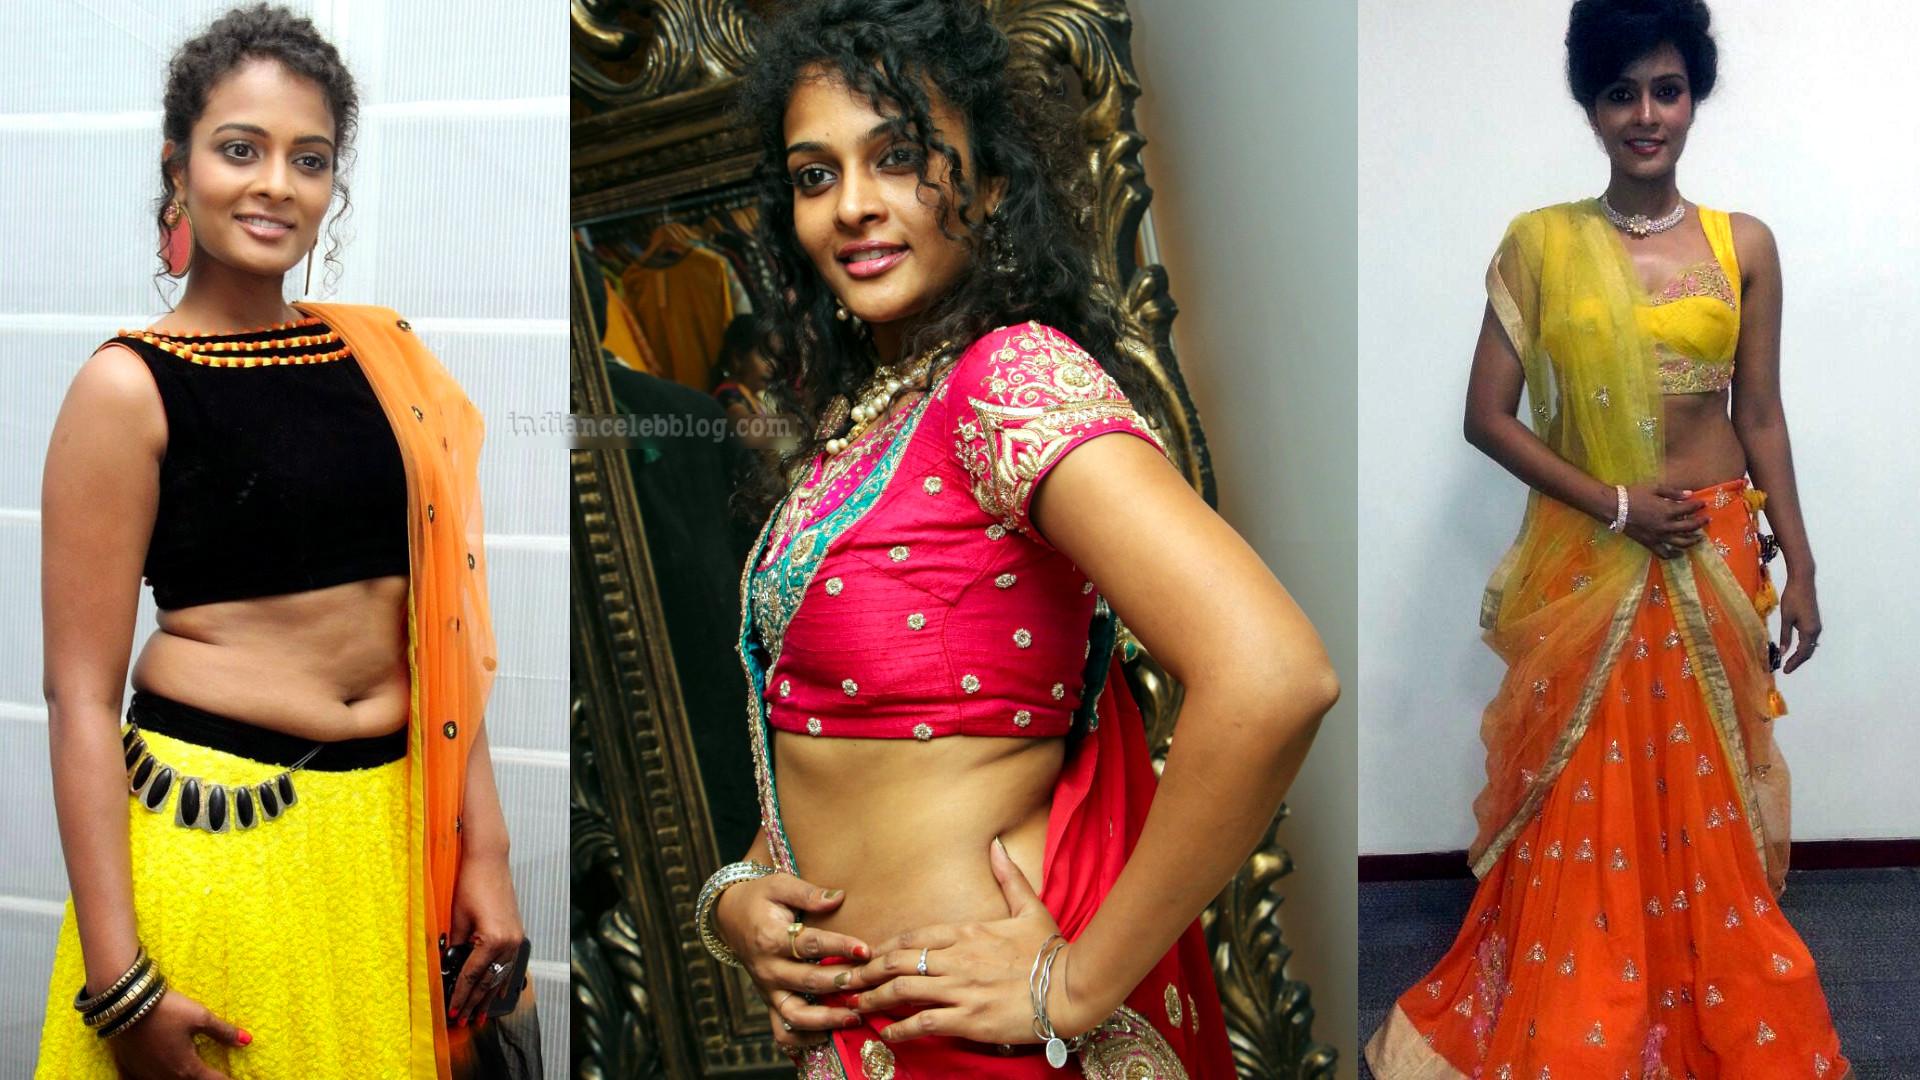 Sonia deepti telugu actress hot midriff show pics